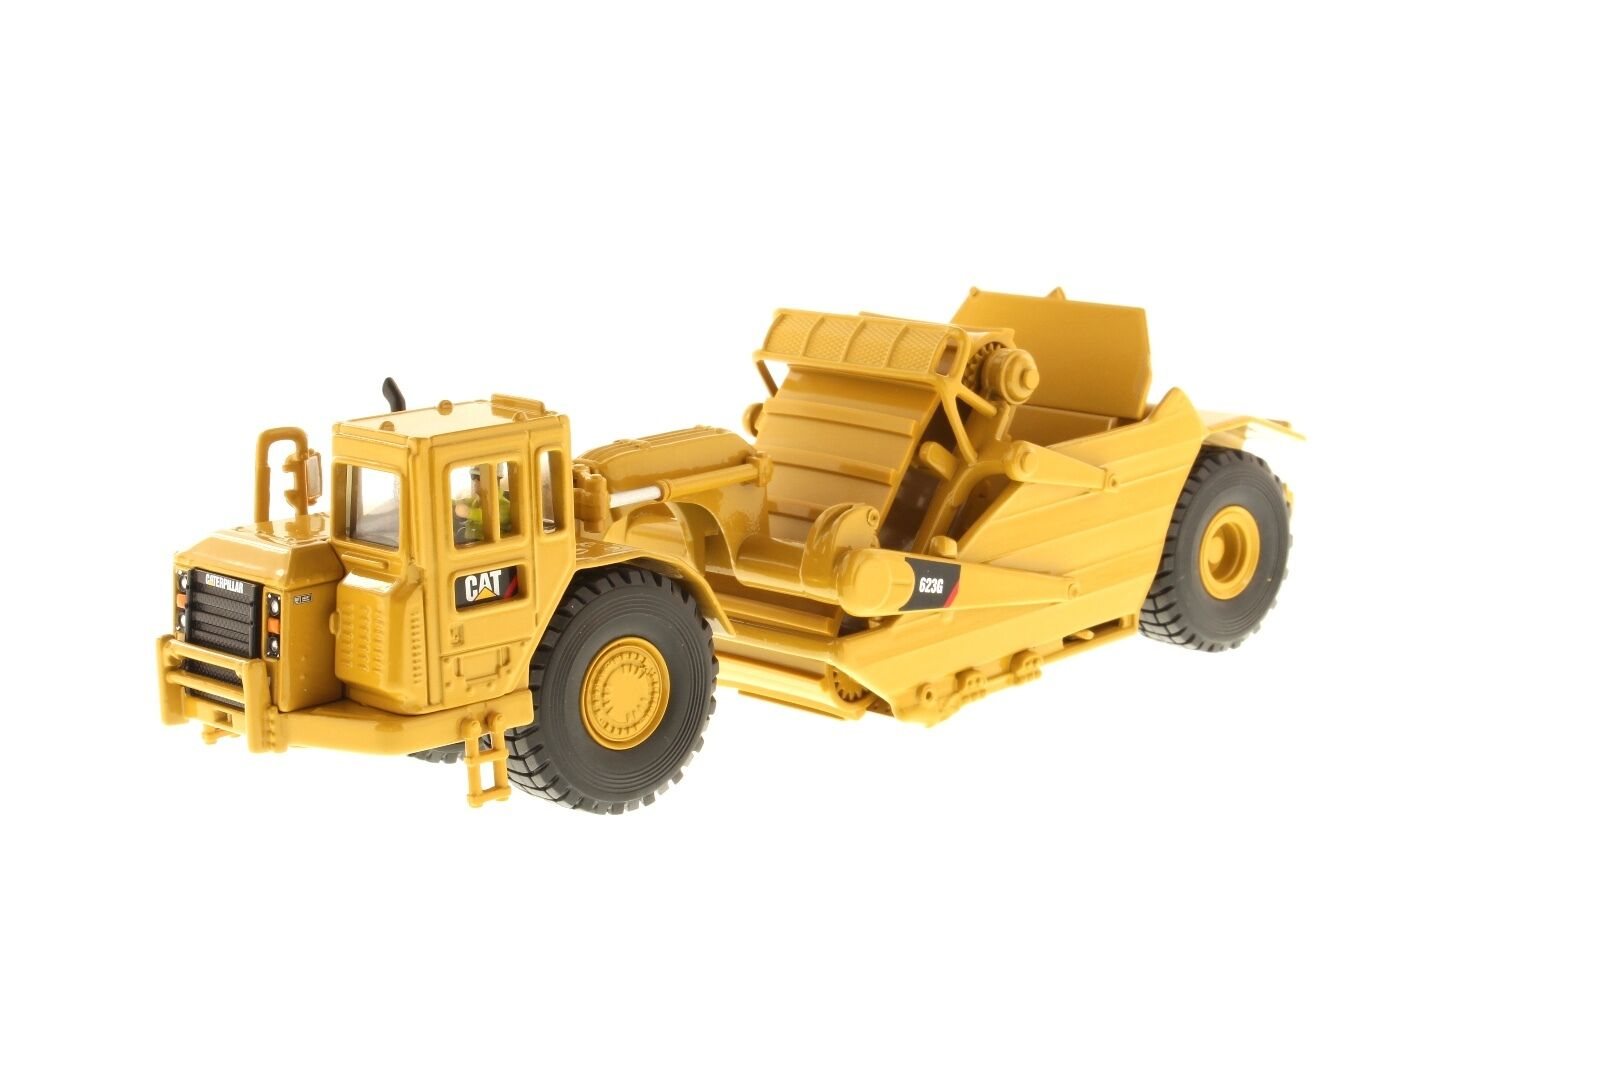 Caterpillar ® 1 50 Escala Cat 623G que eleva Raspador-Diecast Masters 85097